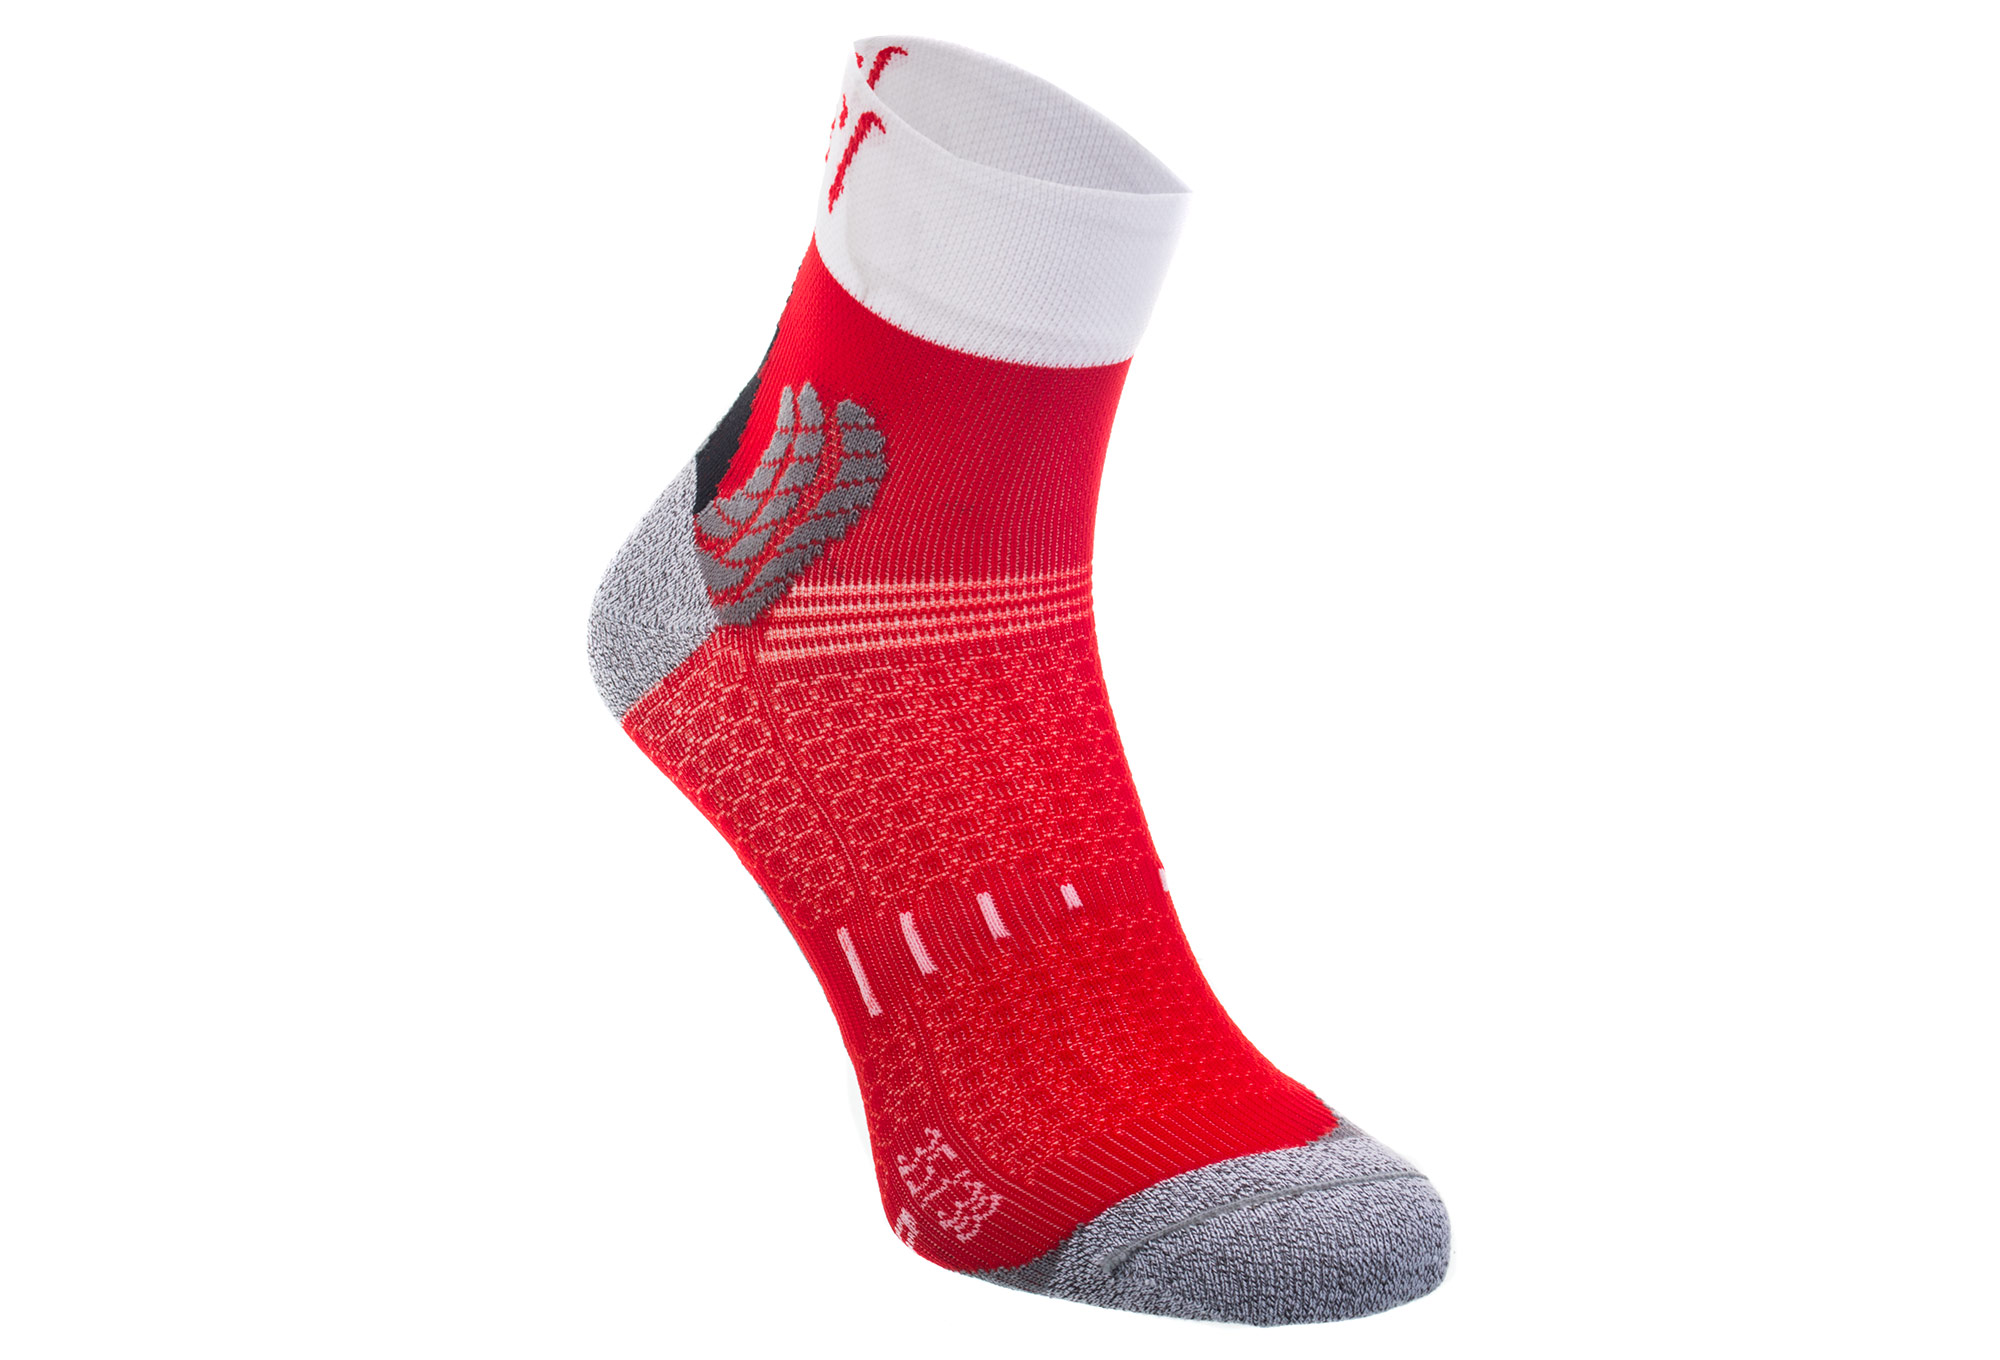 paire de chaussettes running rafa l nairobie blanc rouge. Black Bedroom Furniture Sets. Home Design Ideas